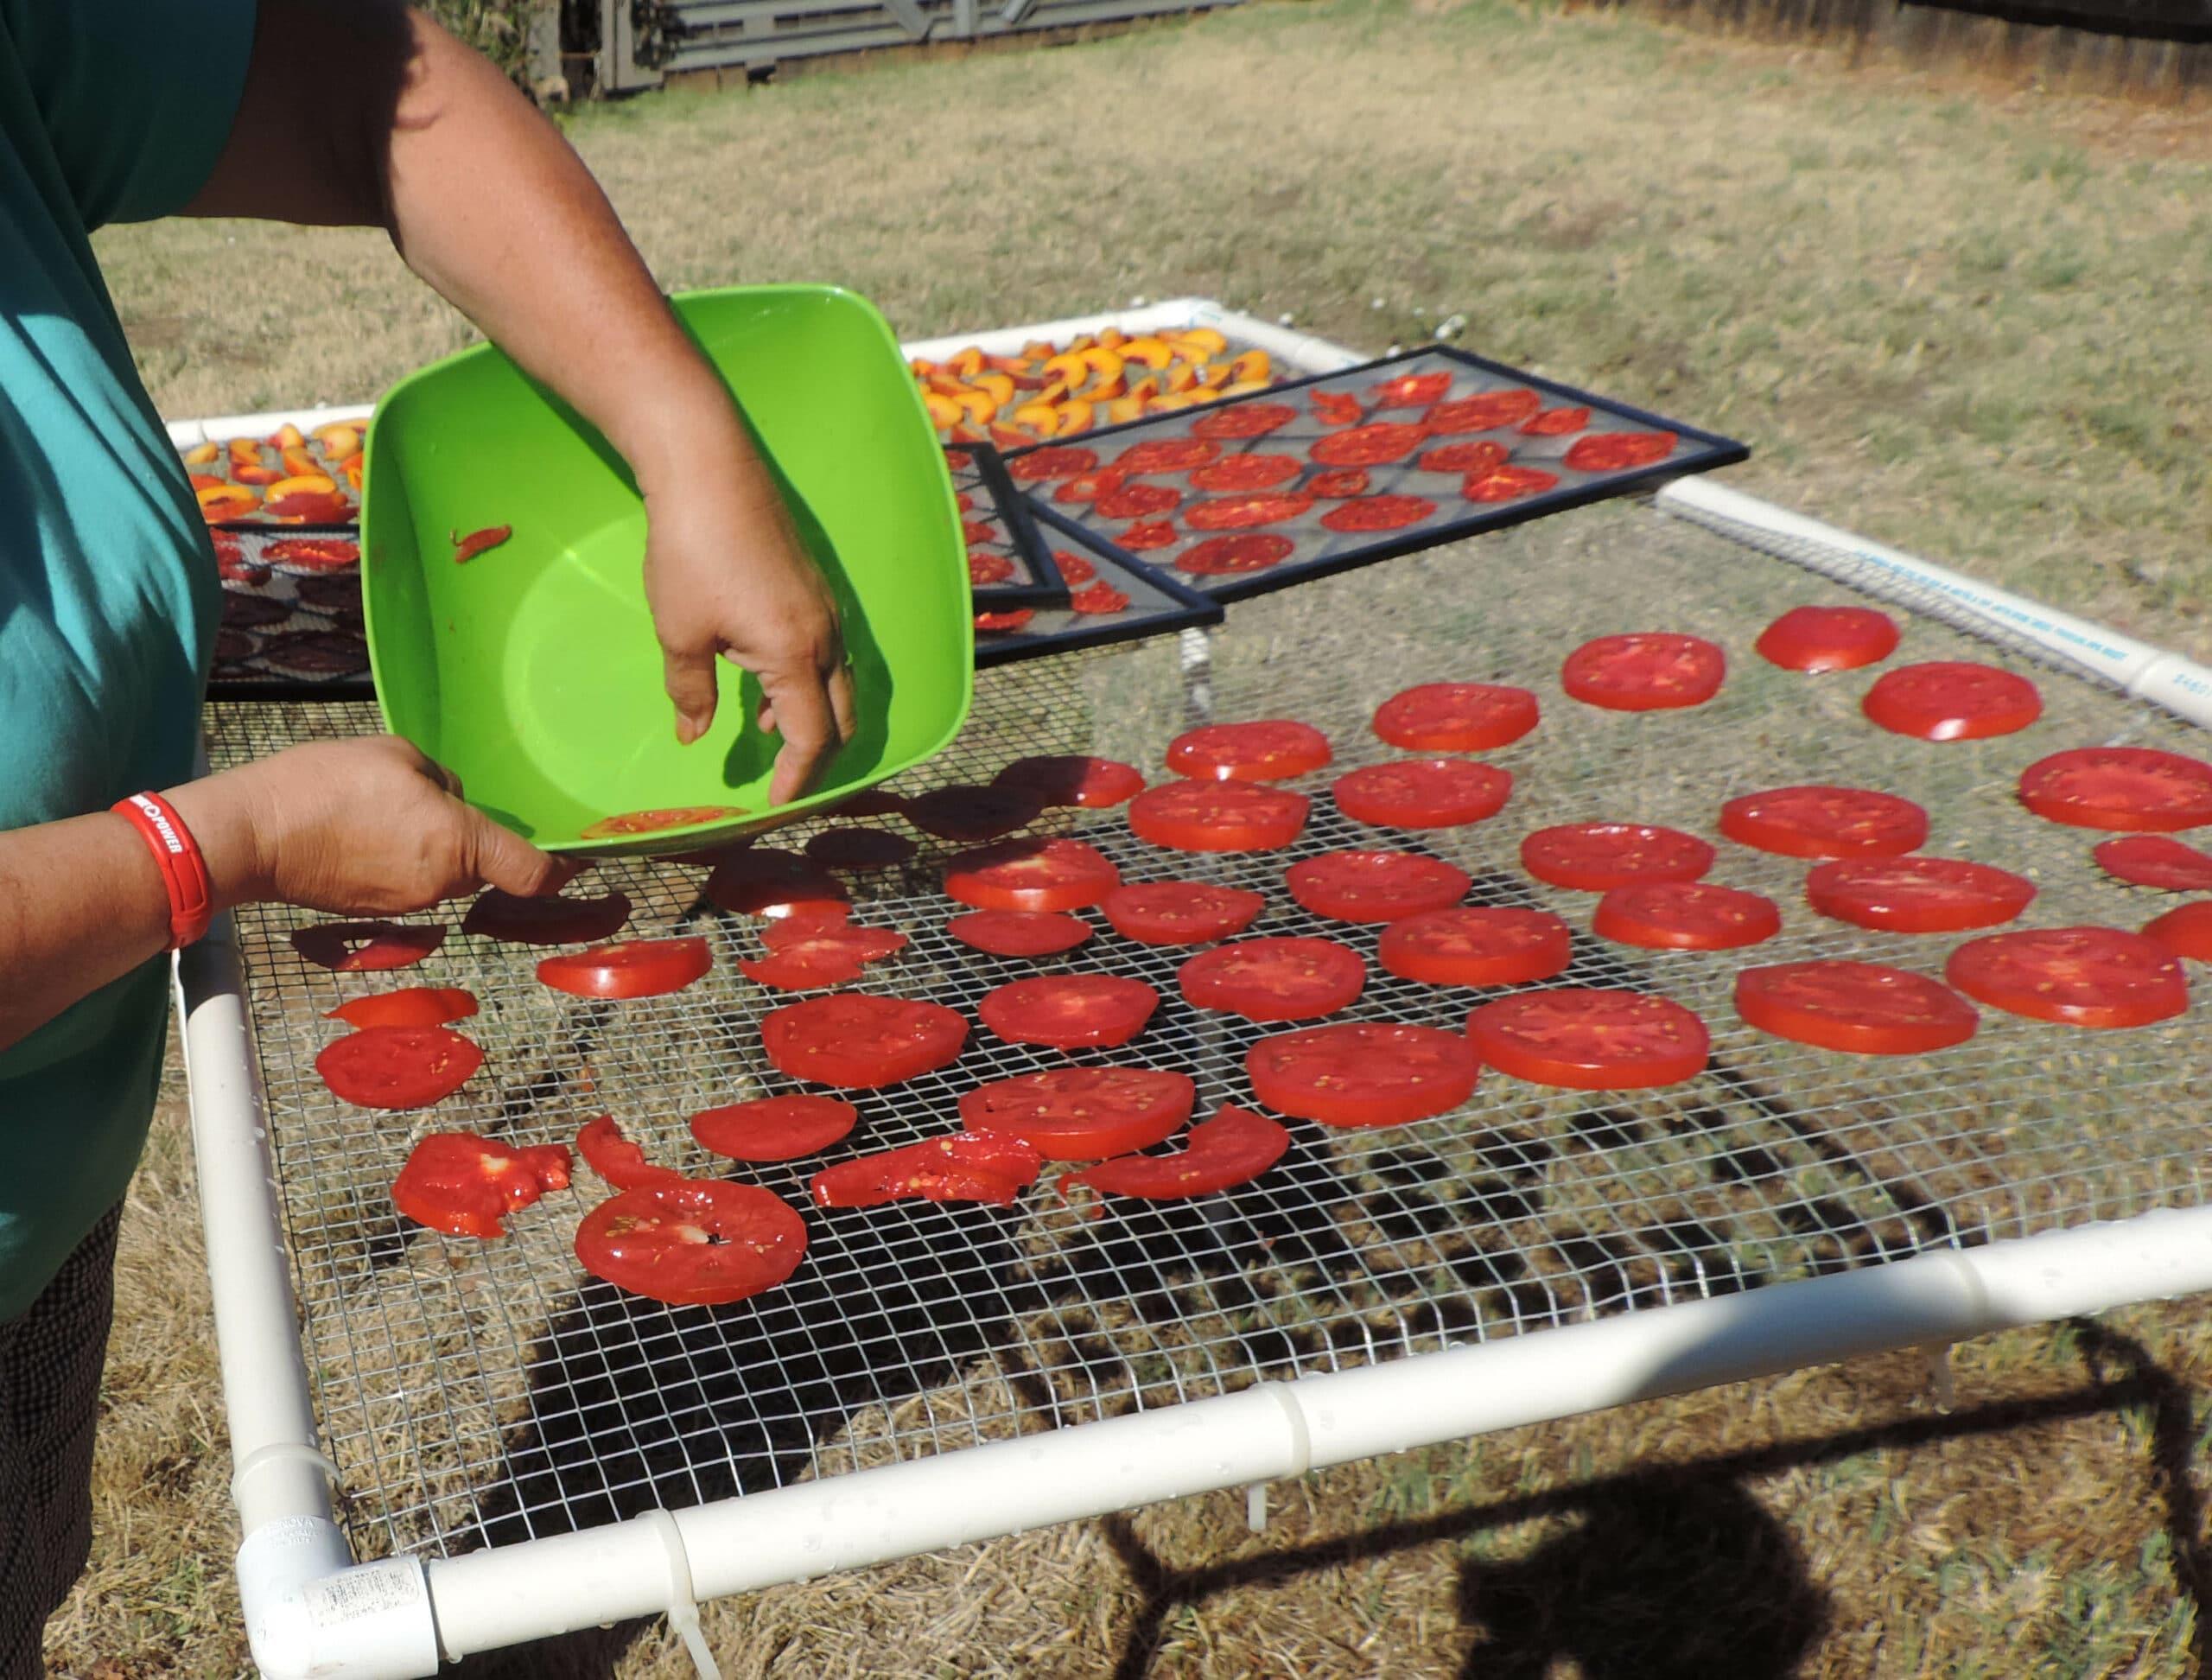 drying tomatoes outdoors preparedness advicepreparedness advice